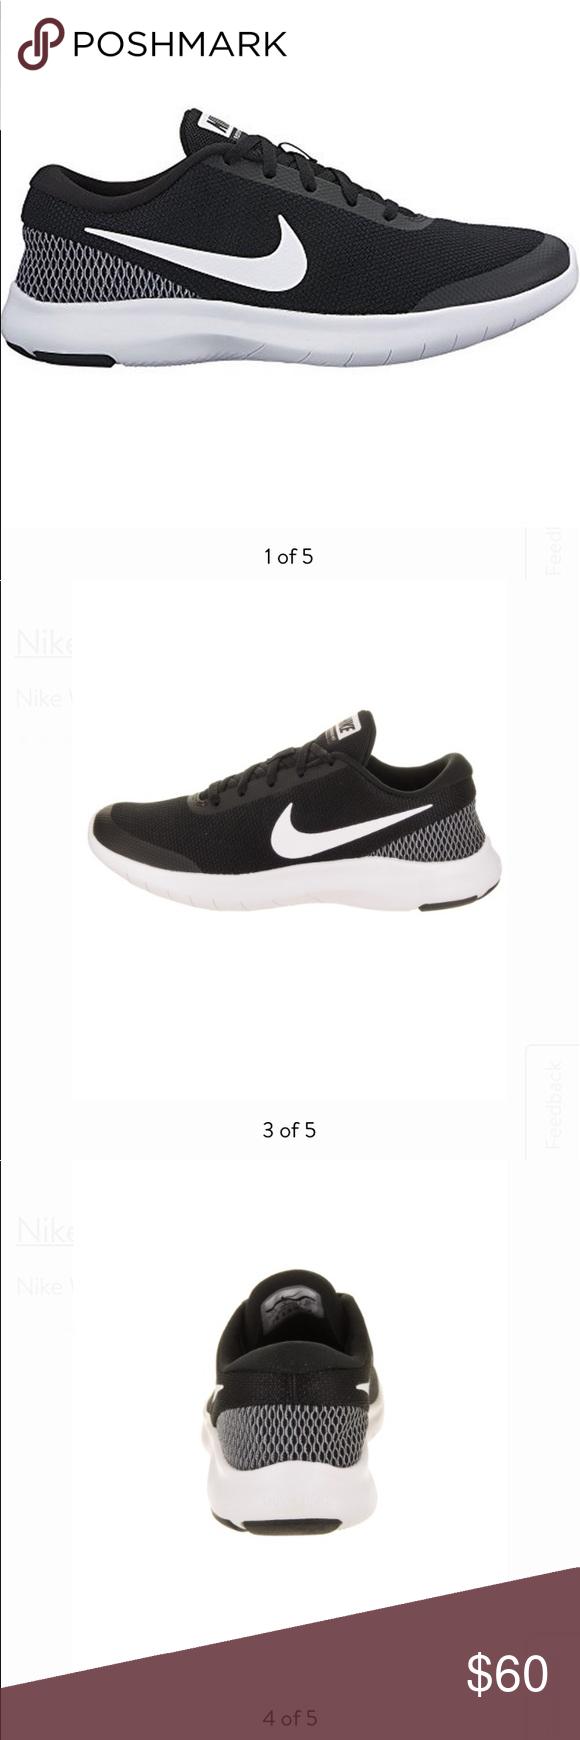 ec582950ee672 Nike Women s Flex Experience Running Shoes New without box. Brand New Nike  women s flex experience